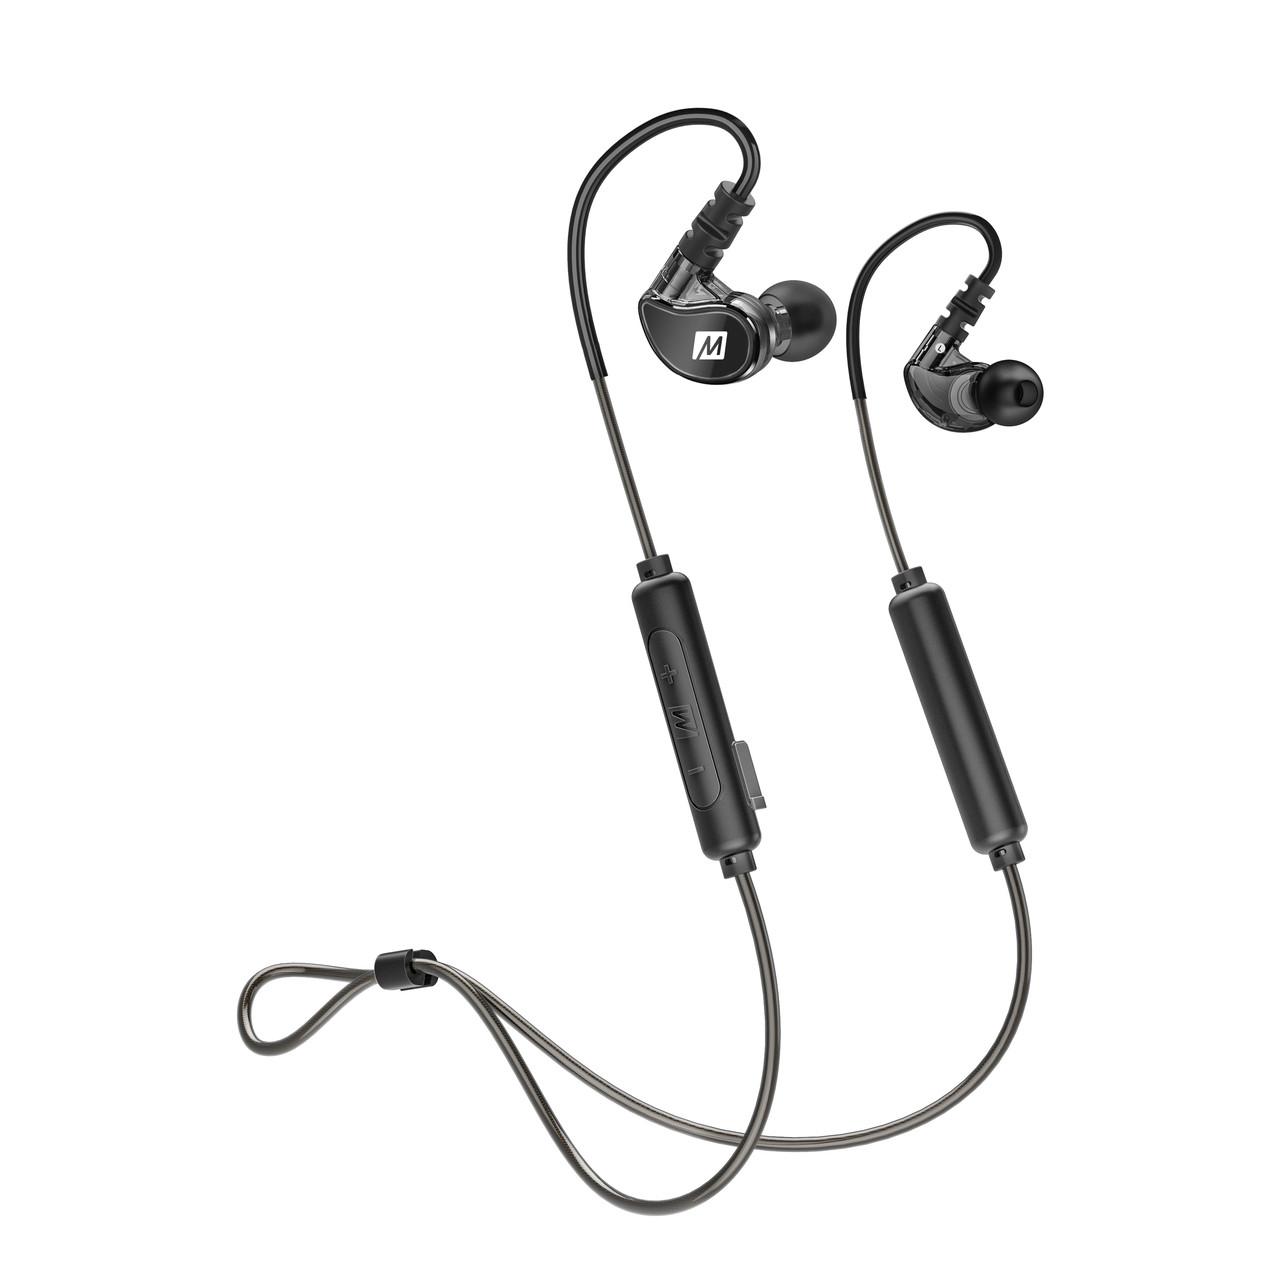 4c75054ffa9 MEE audio X6 Bluetooth Wireless Sports In-Ear Headset